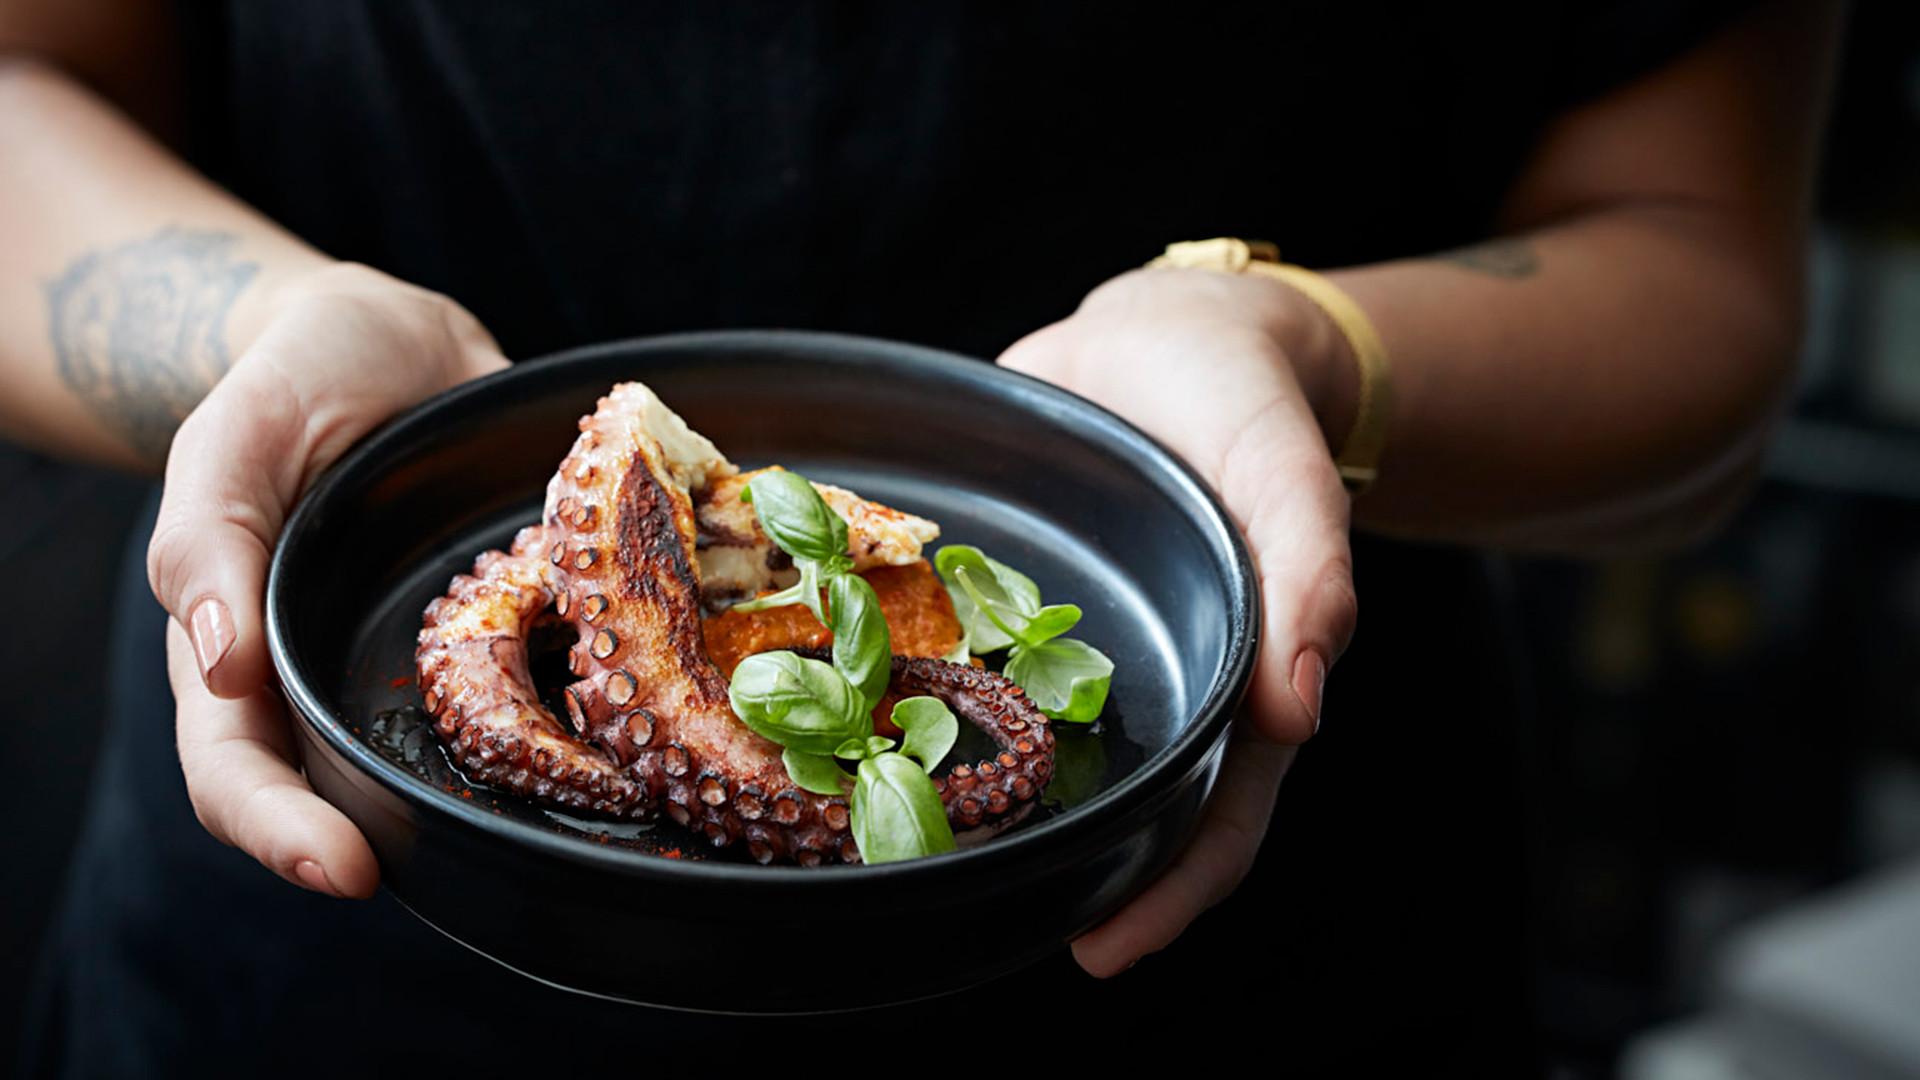 London's best seafood restaurants – Prawn on the Lawn